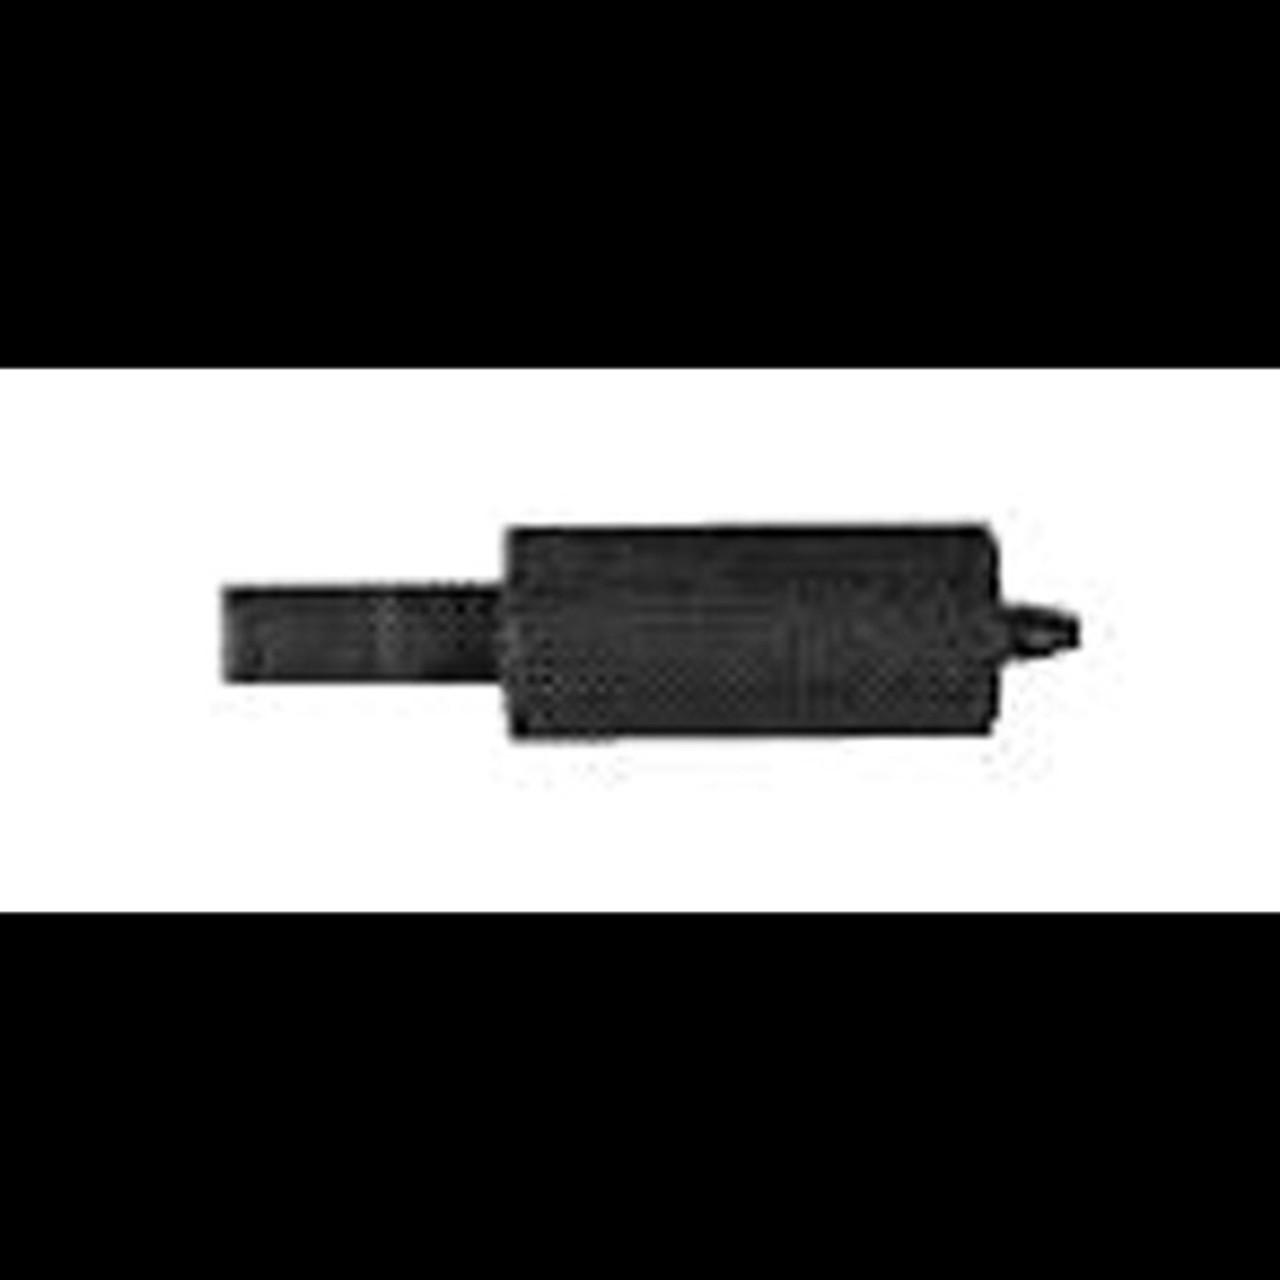 Lisle 36440 Replacement Metric Valve Keeper Installer